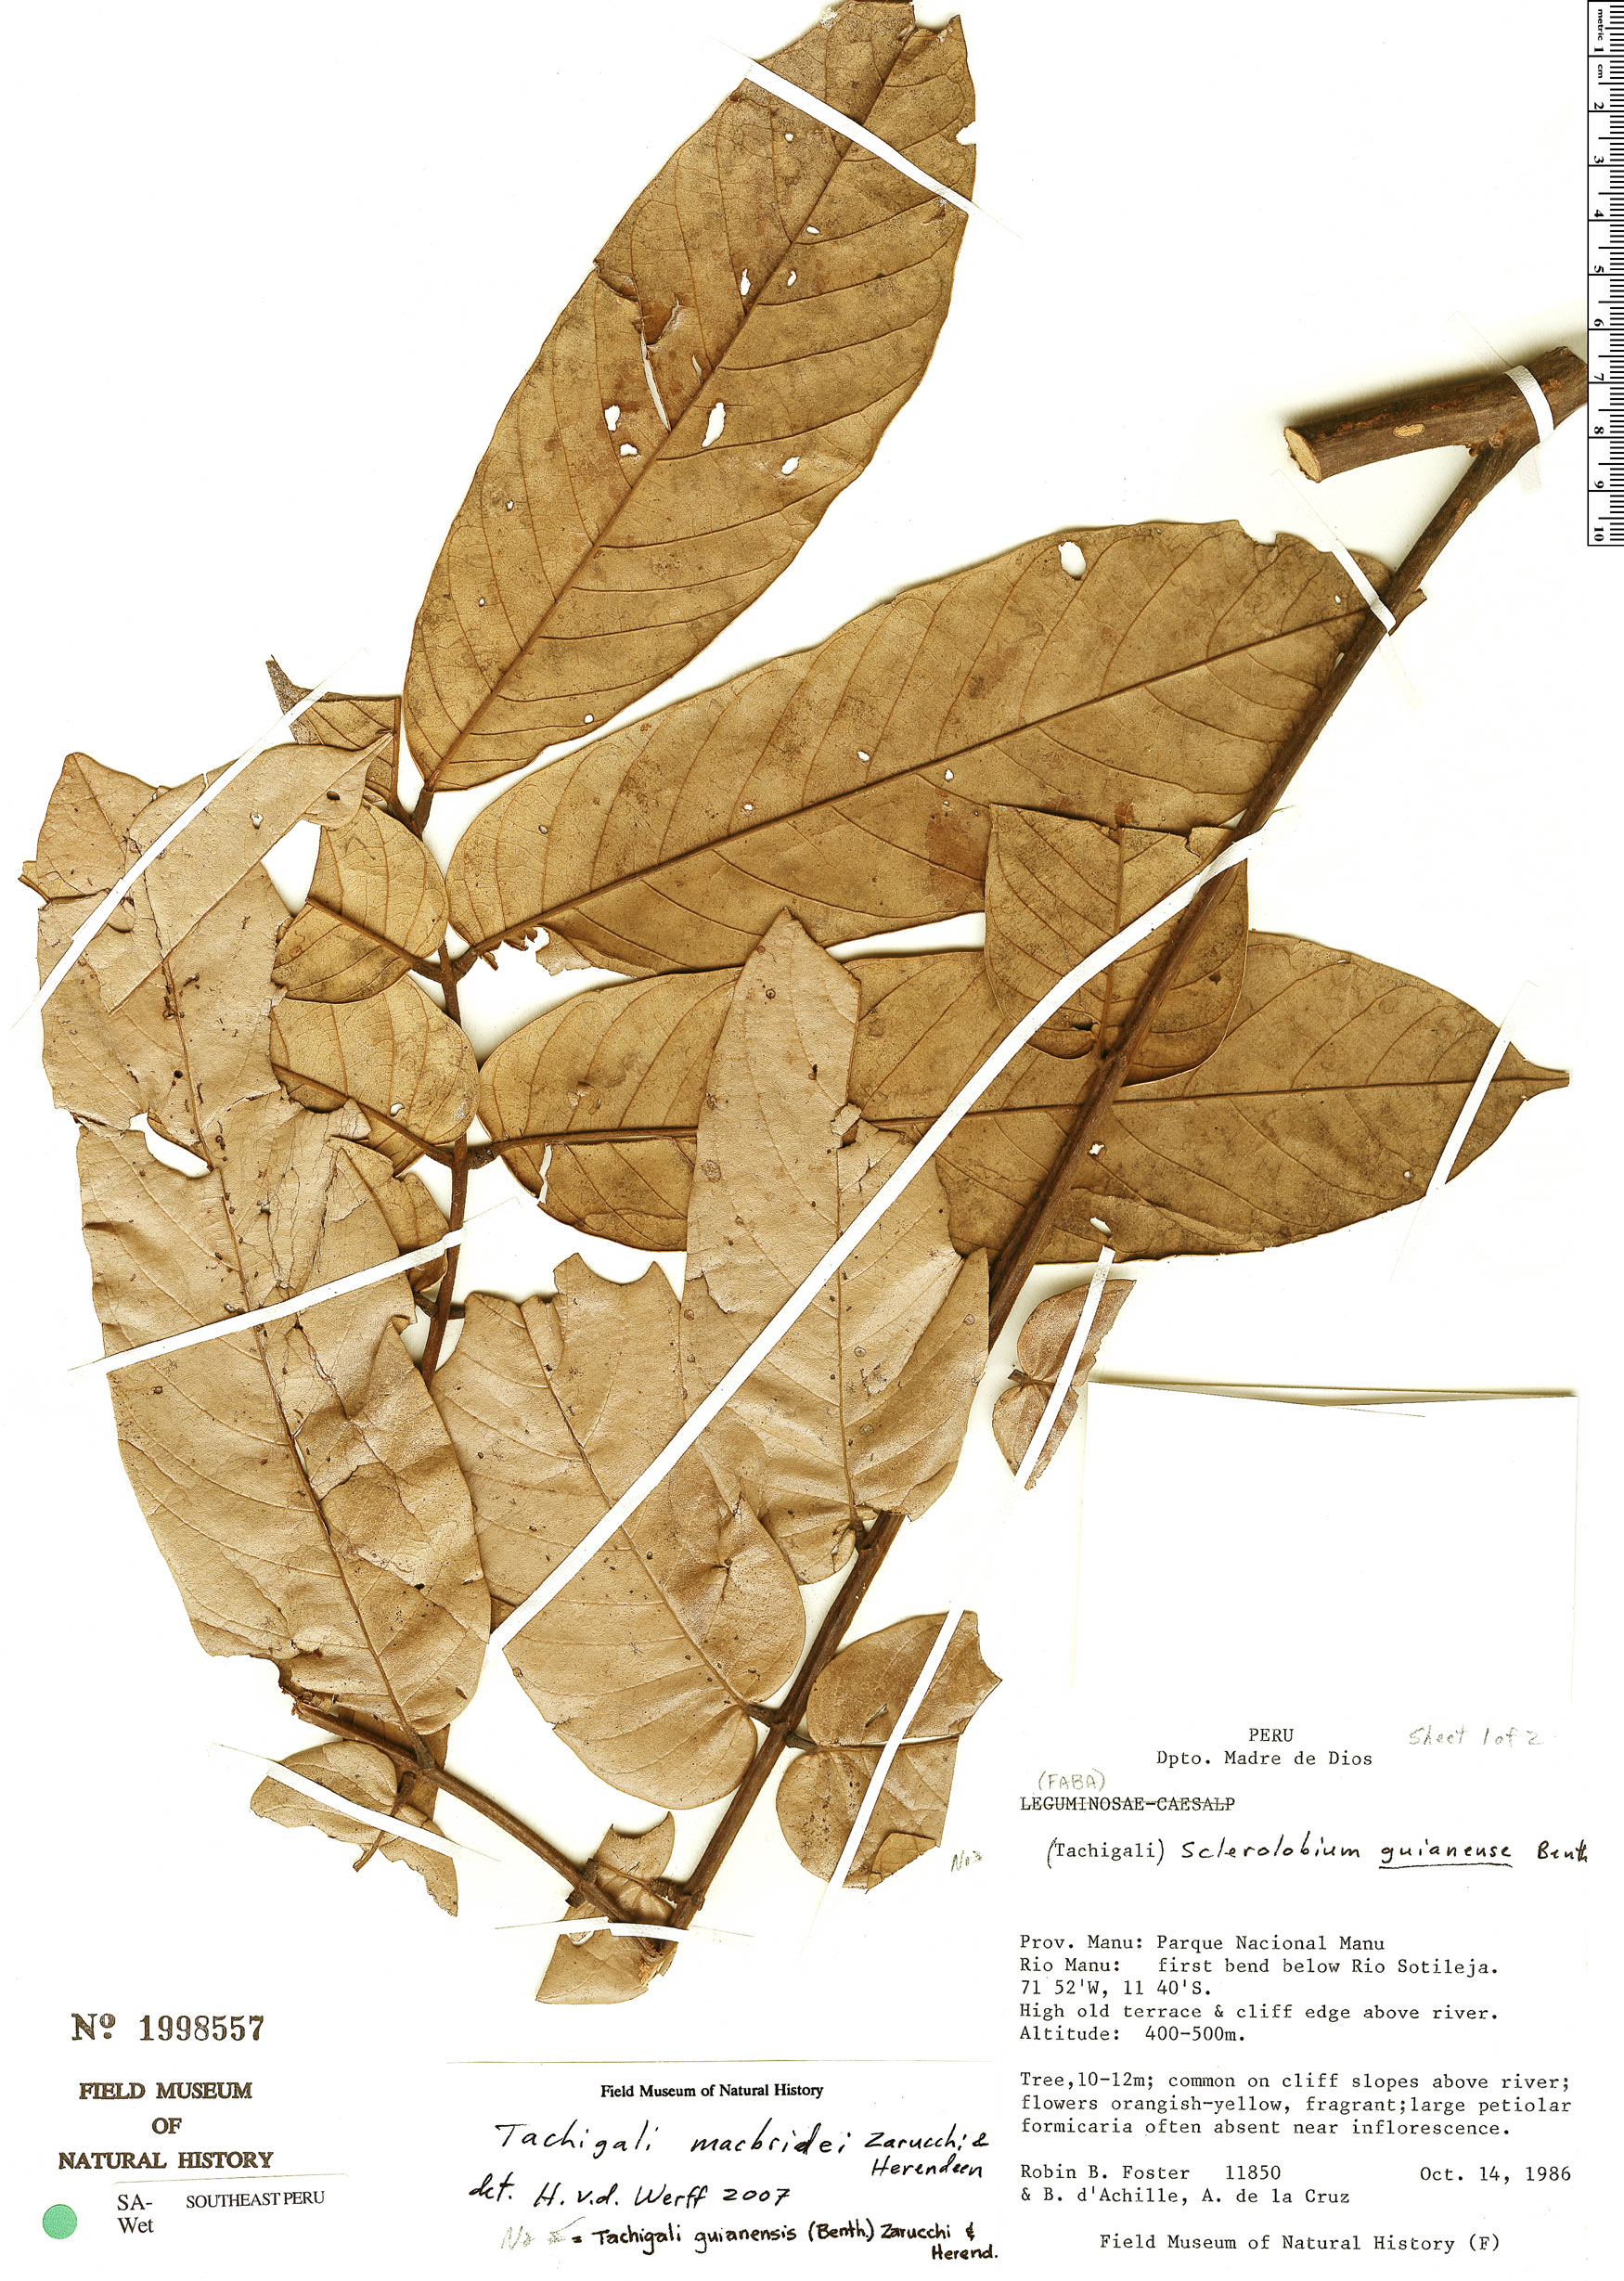 Specimen: Tachigali macbridei